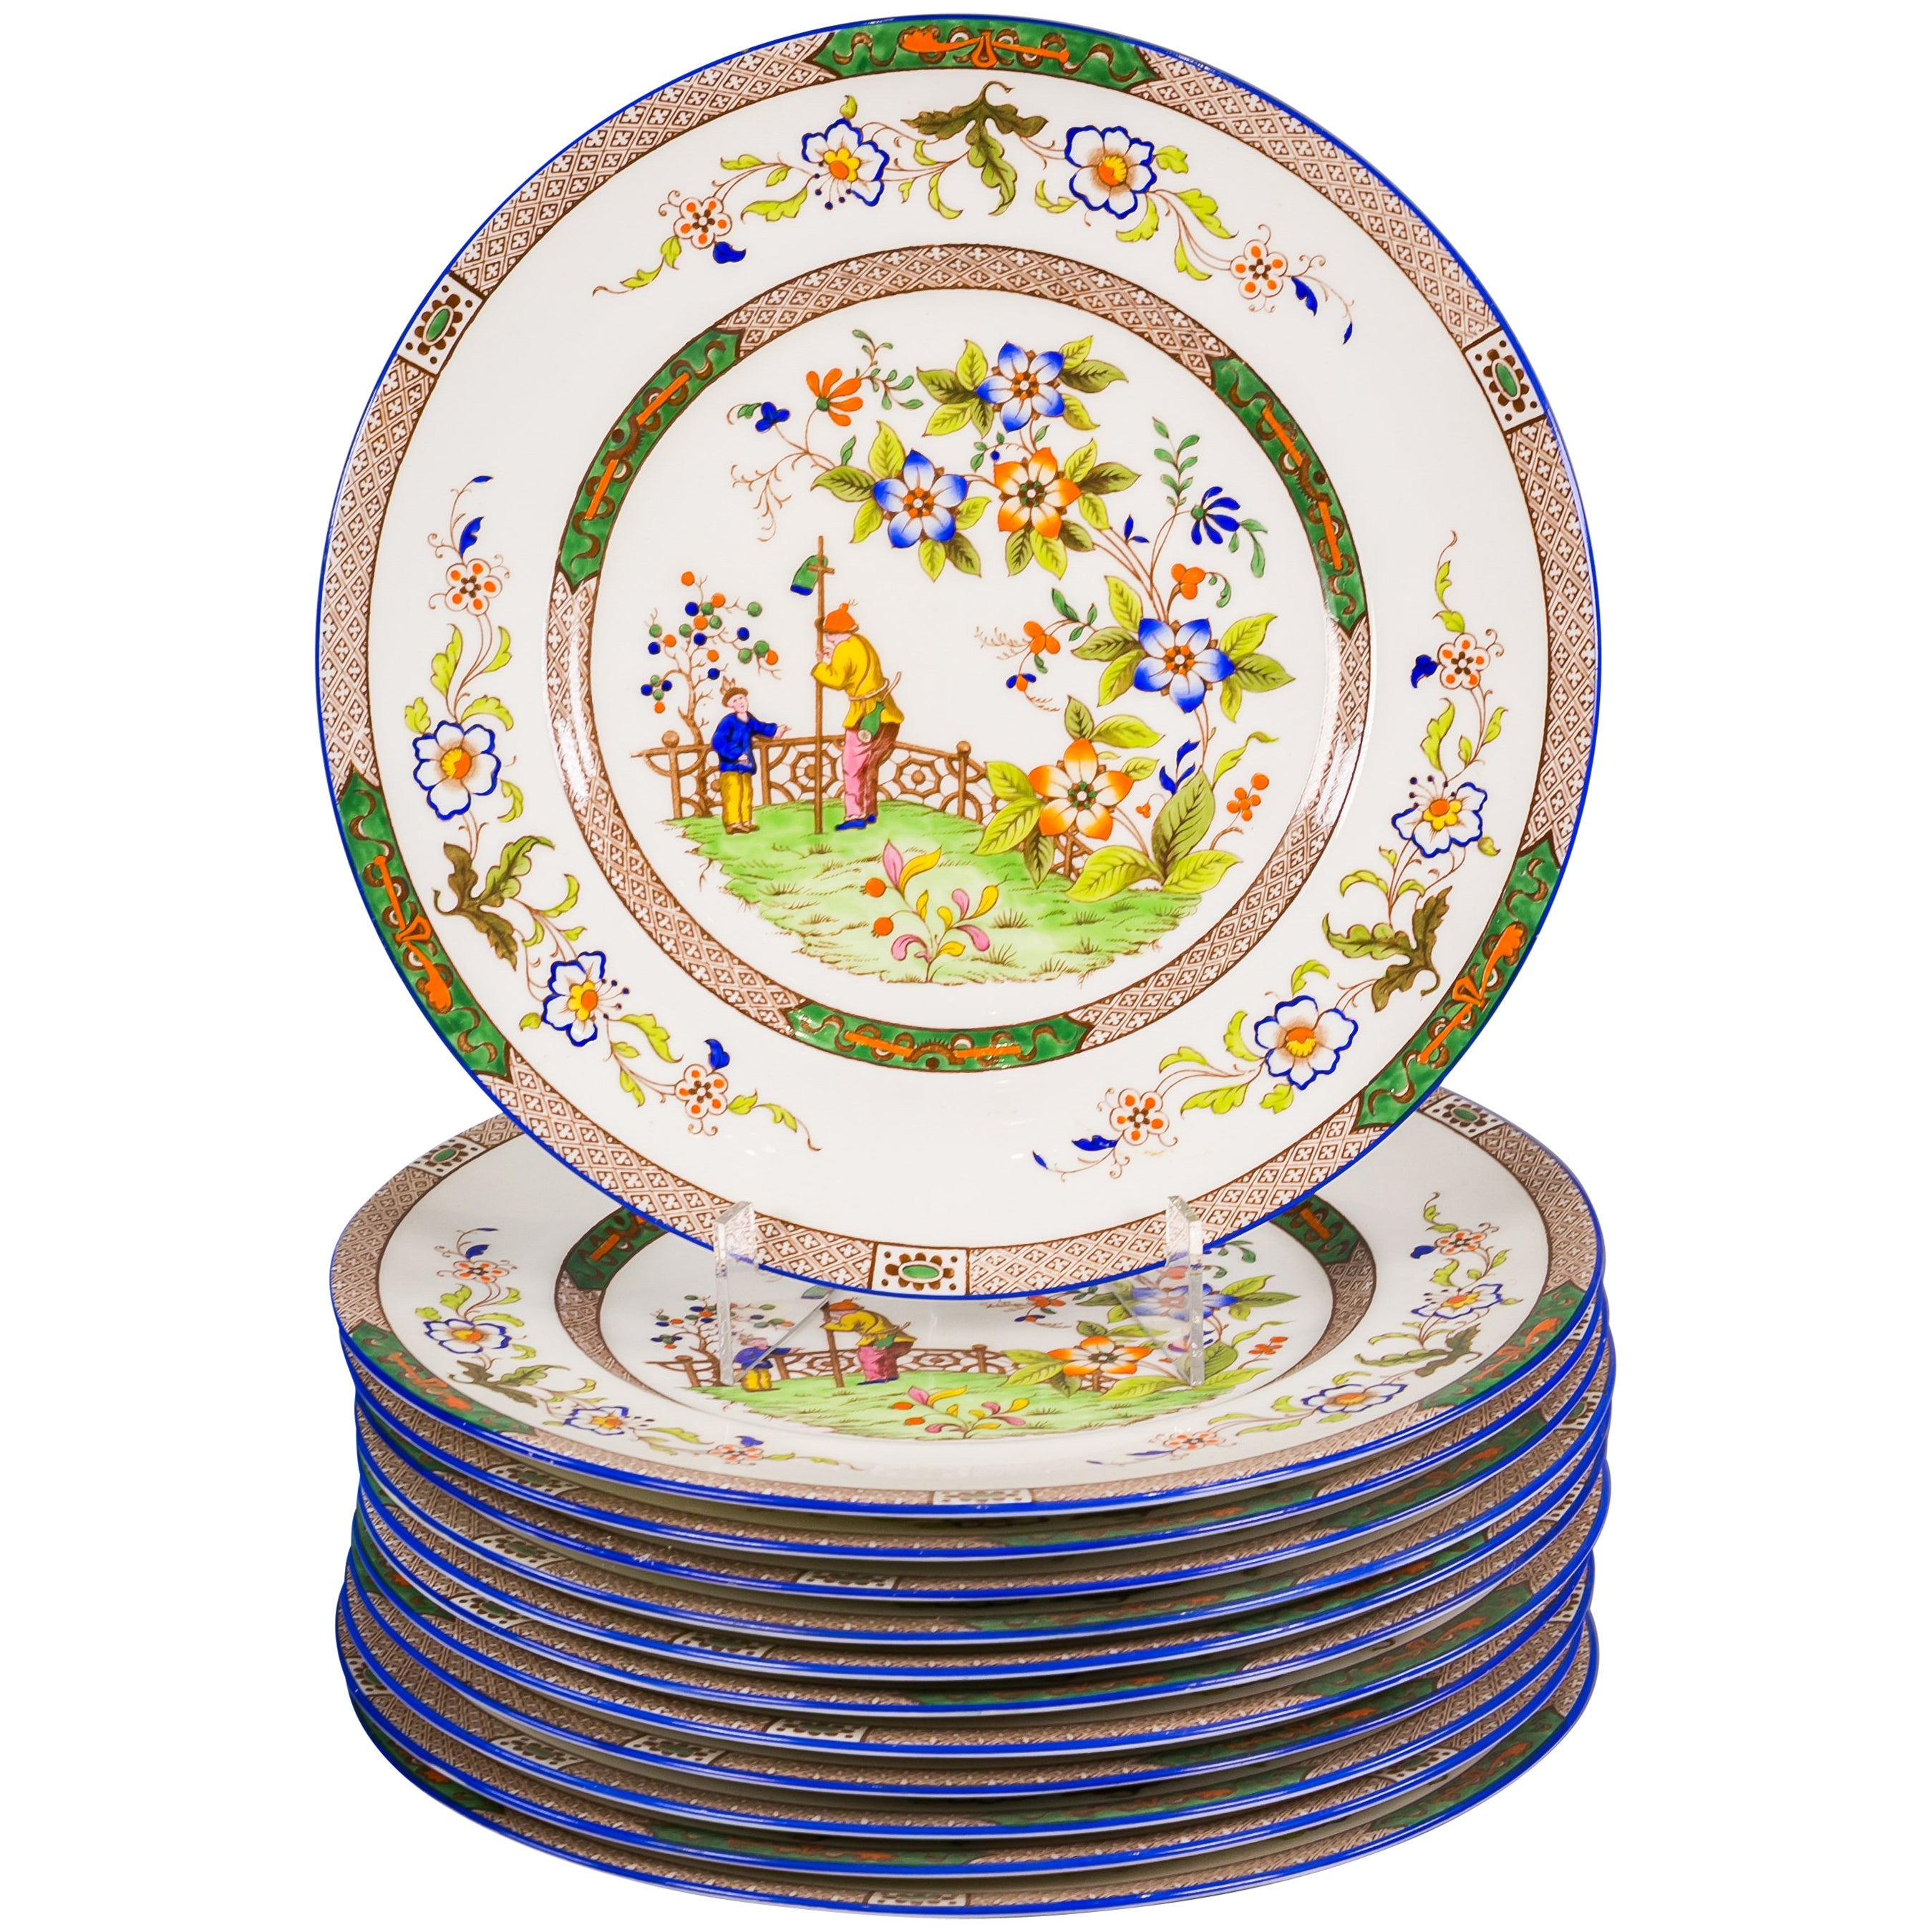 Set of Twelve English Porcelain Dinner Plates, Coalport, circa 1900